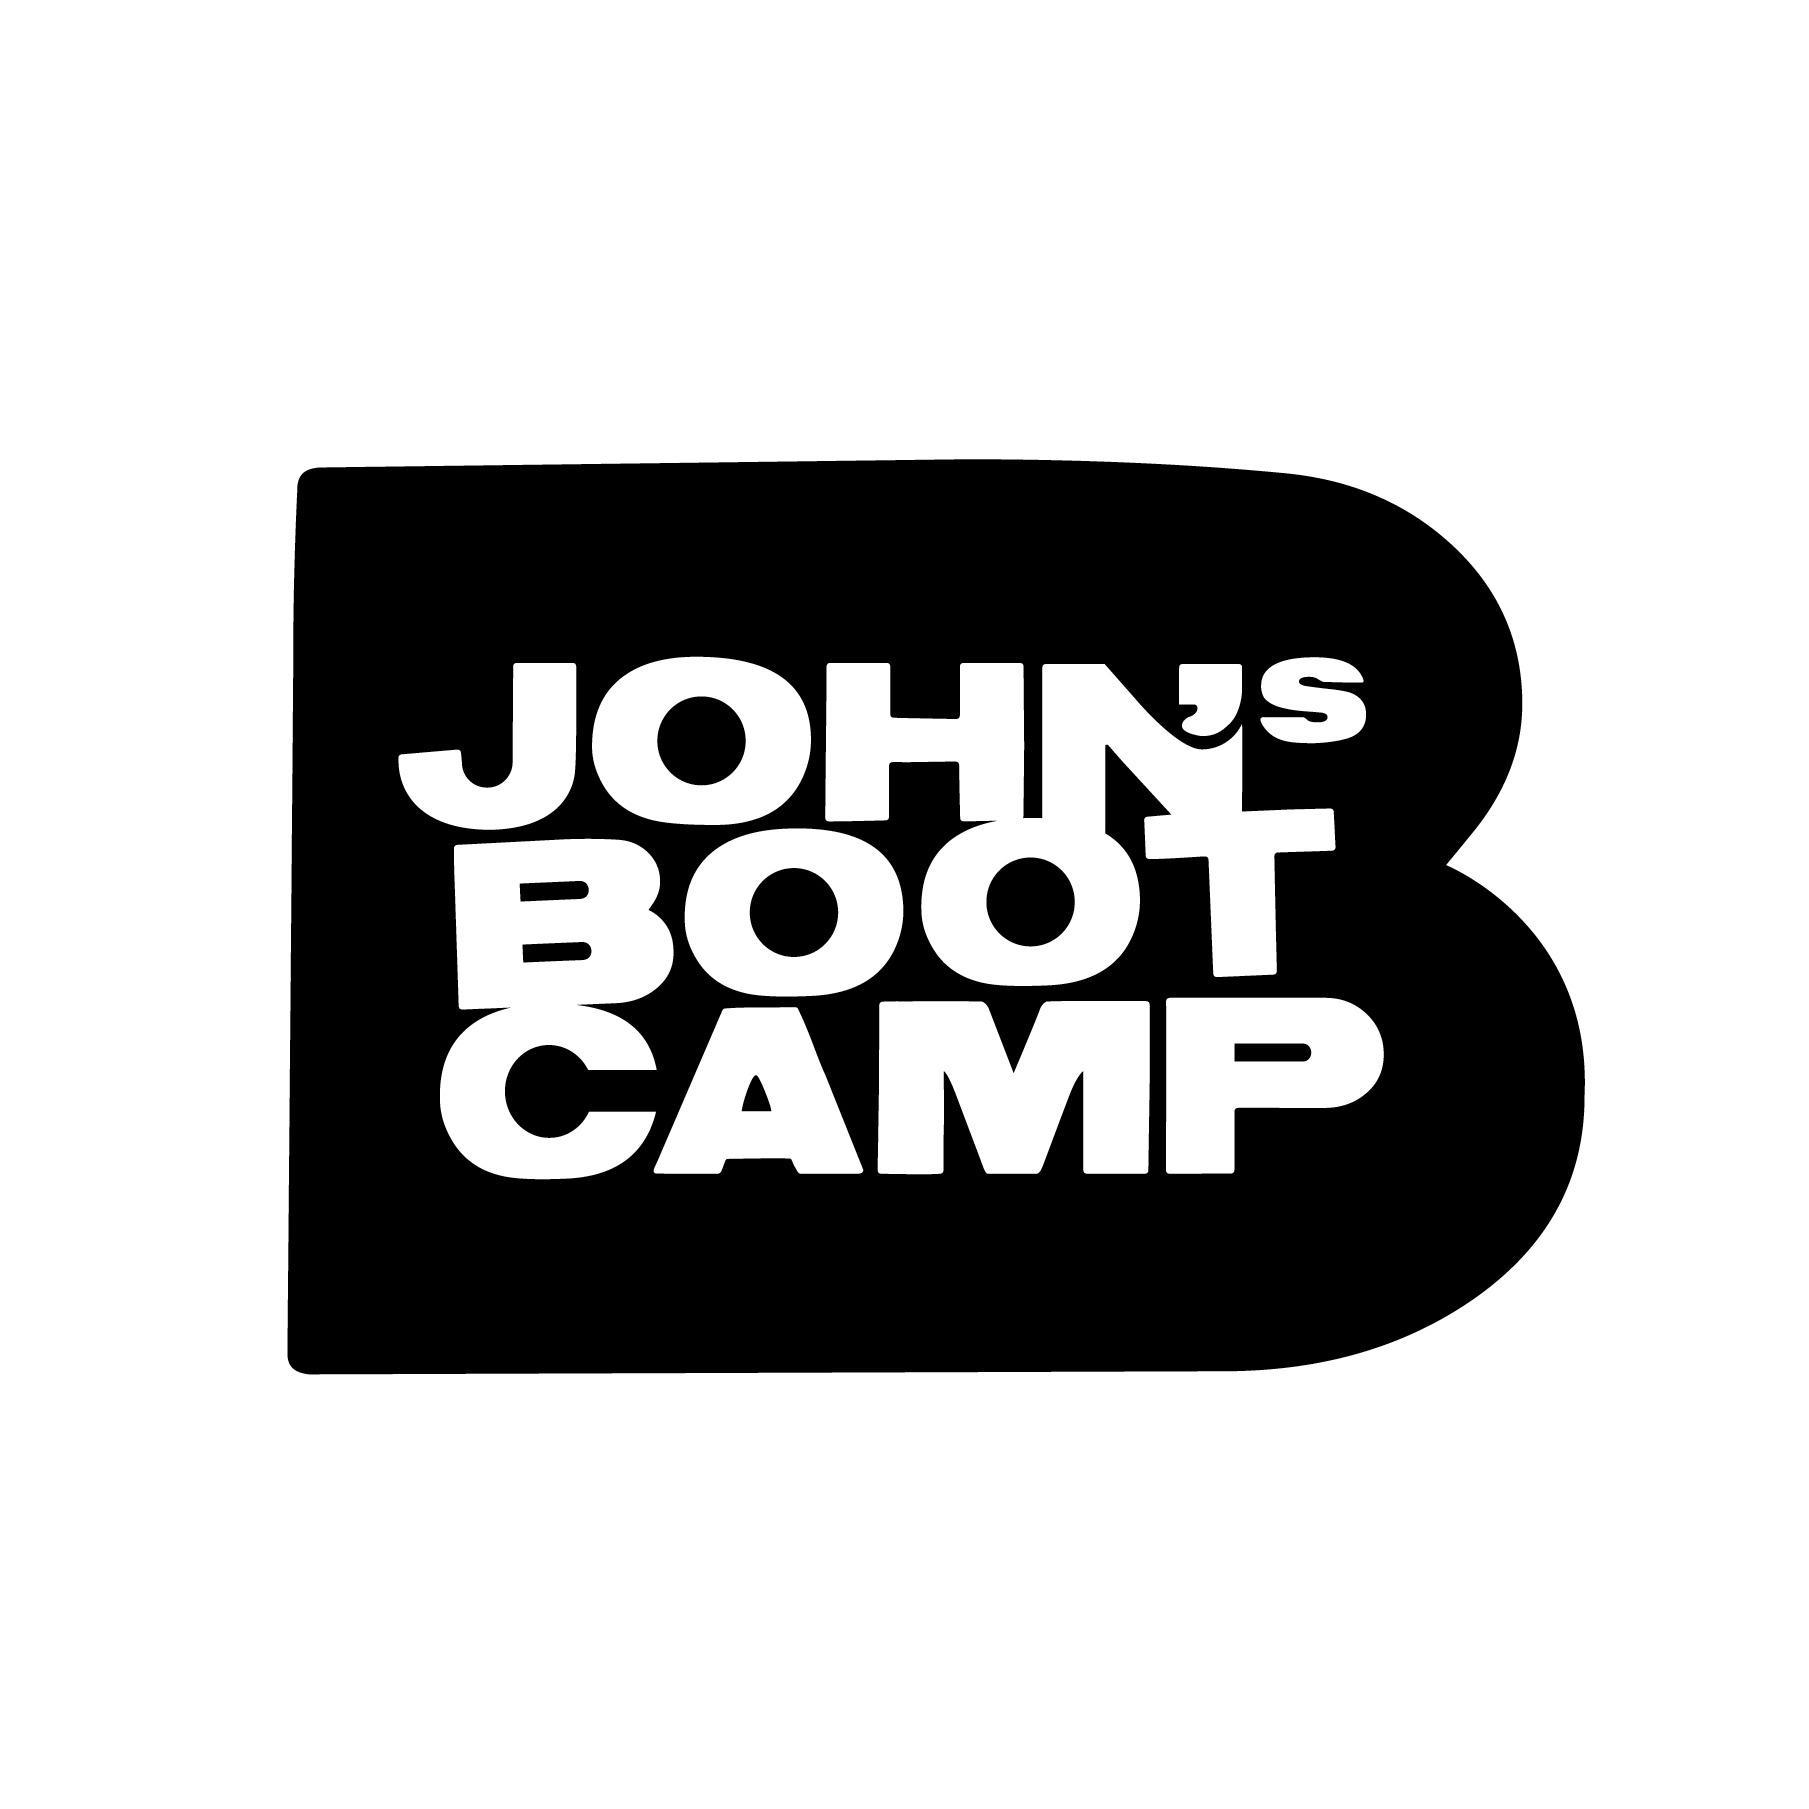 JOHN'S BOOTCAMP